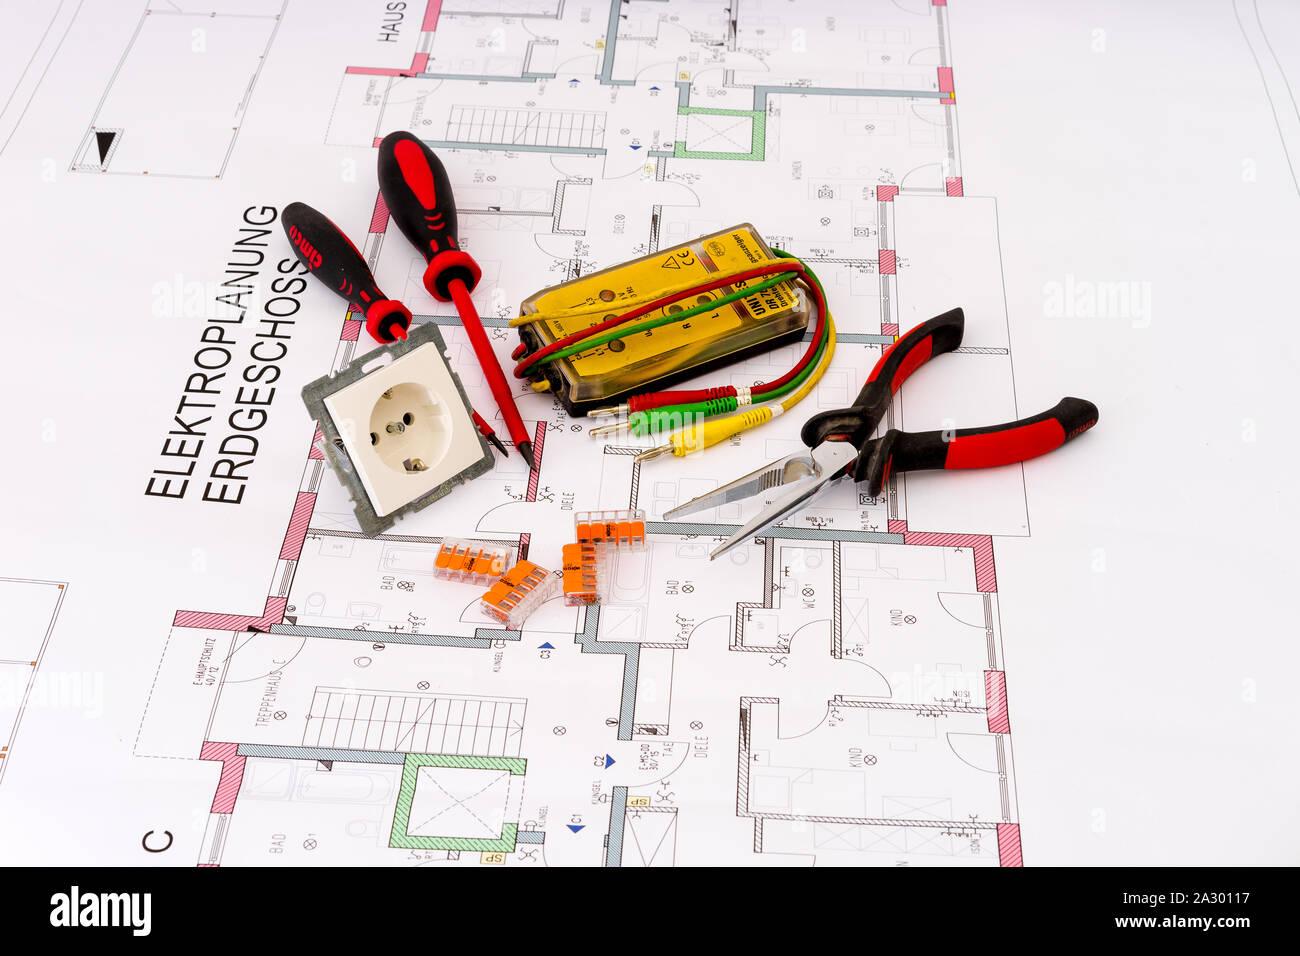 Produktfotografie Haustechnik mit Werkzeugen Stock Photo